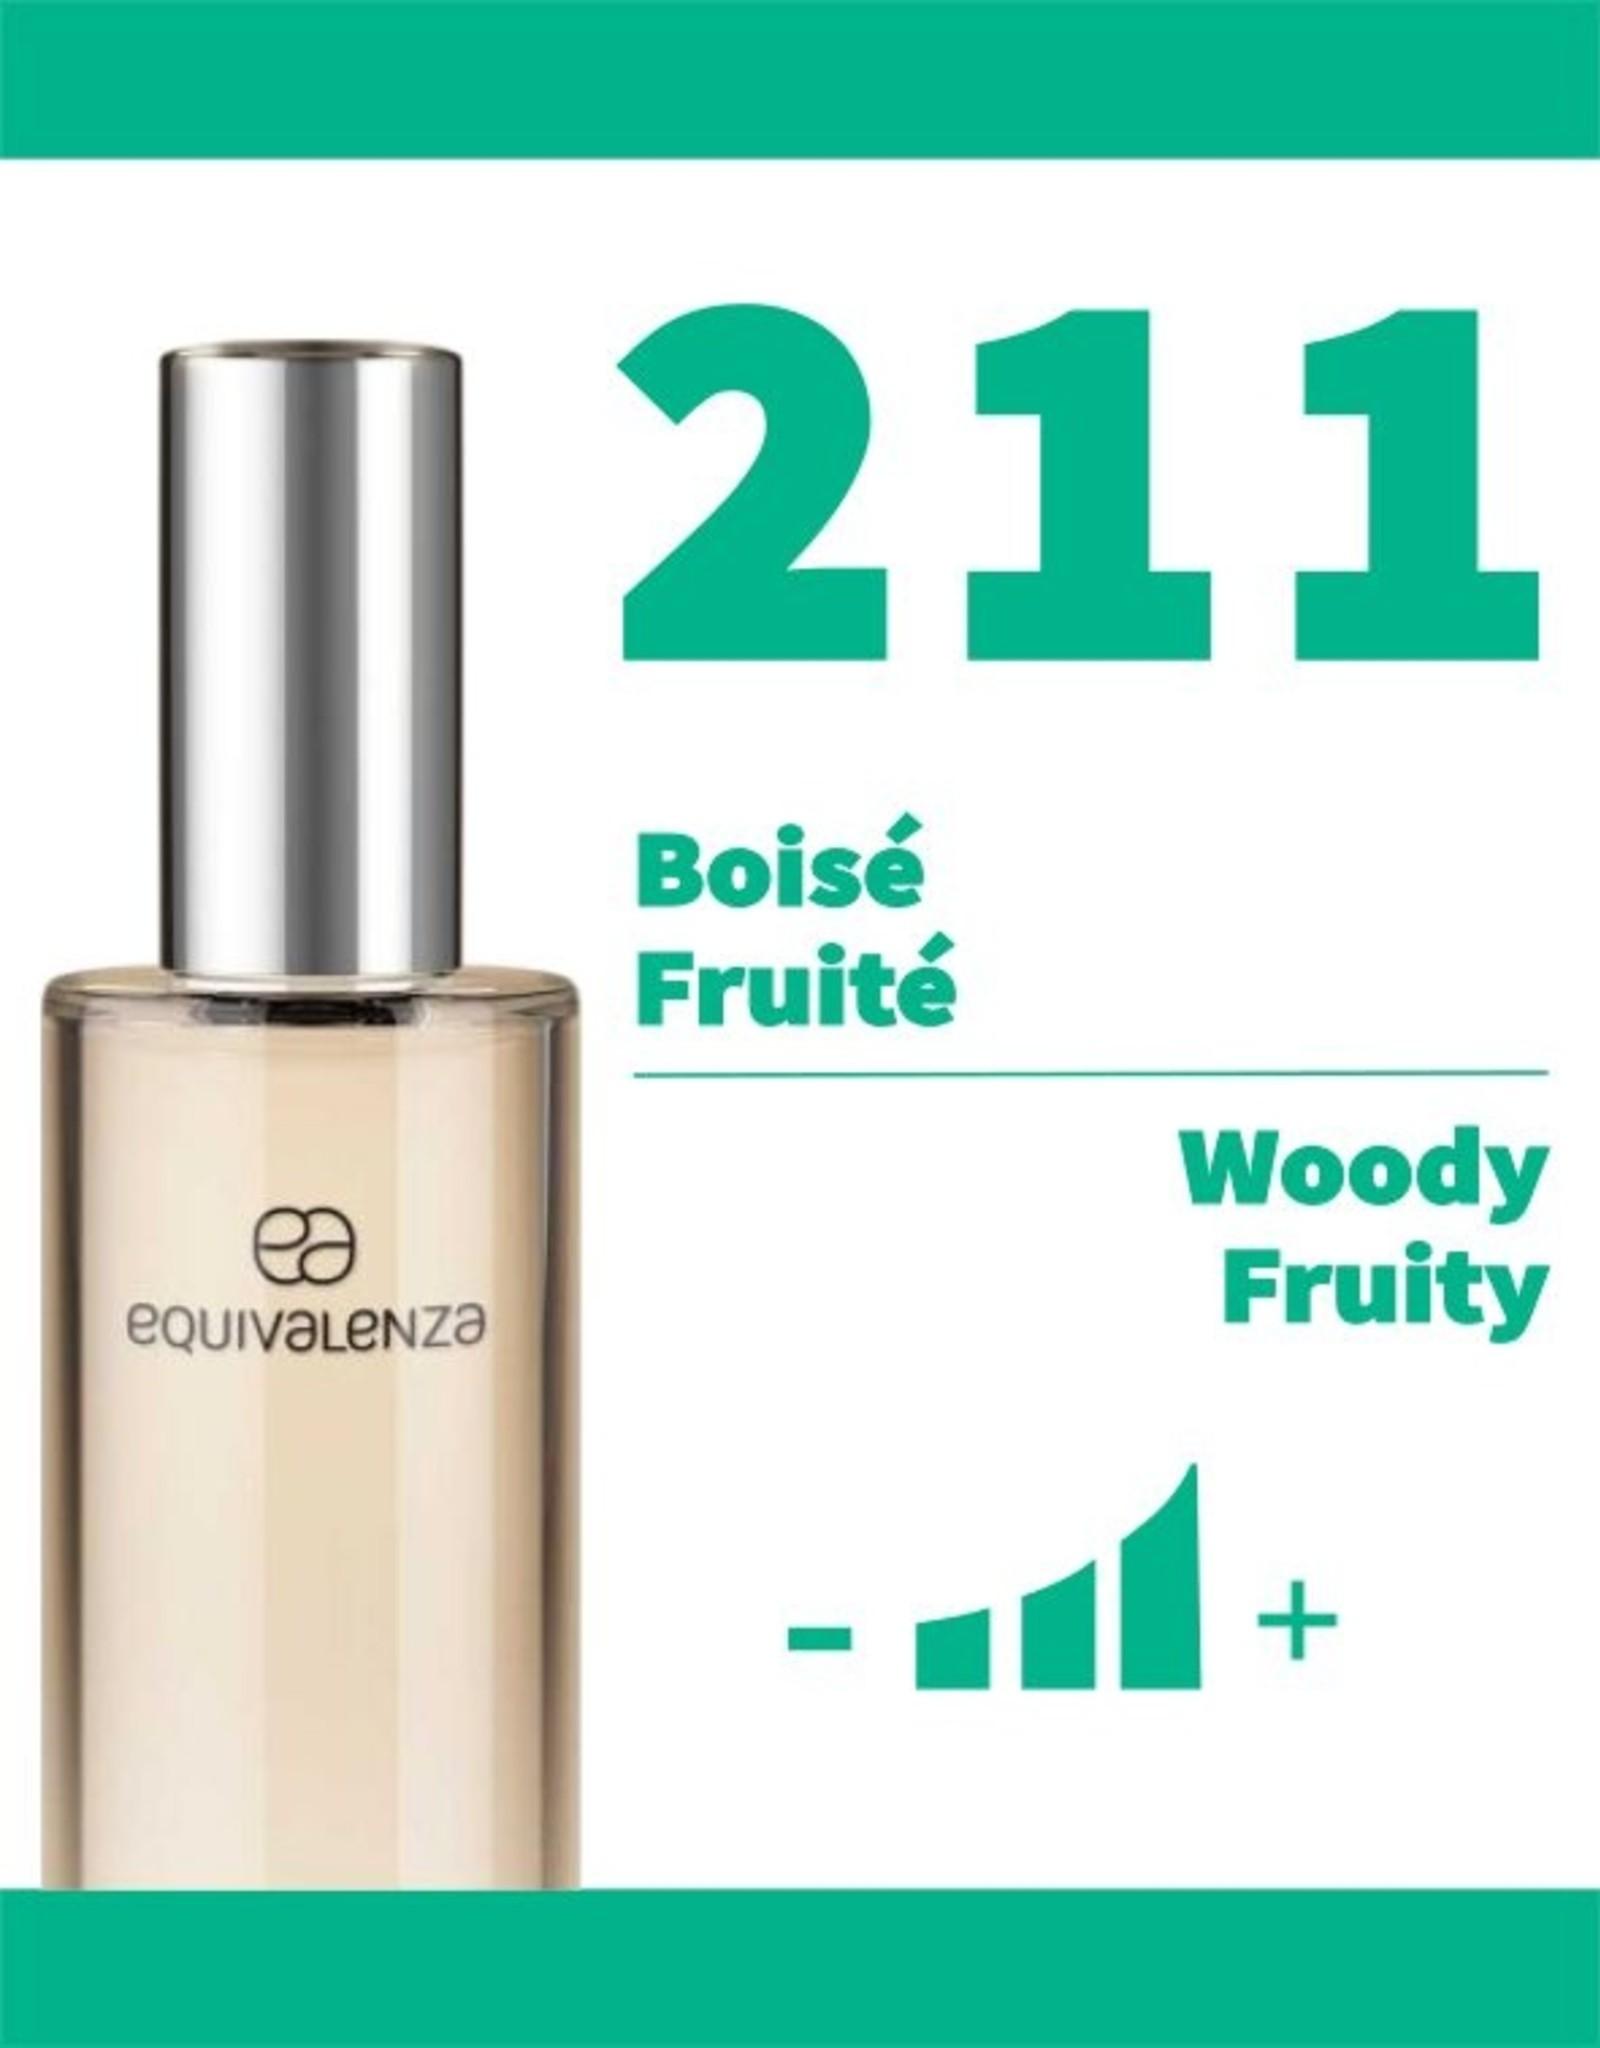 Equivalenza Eau de Toilette Woody Fruity 211